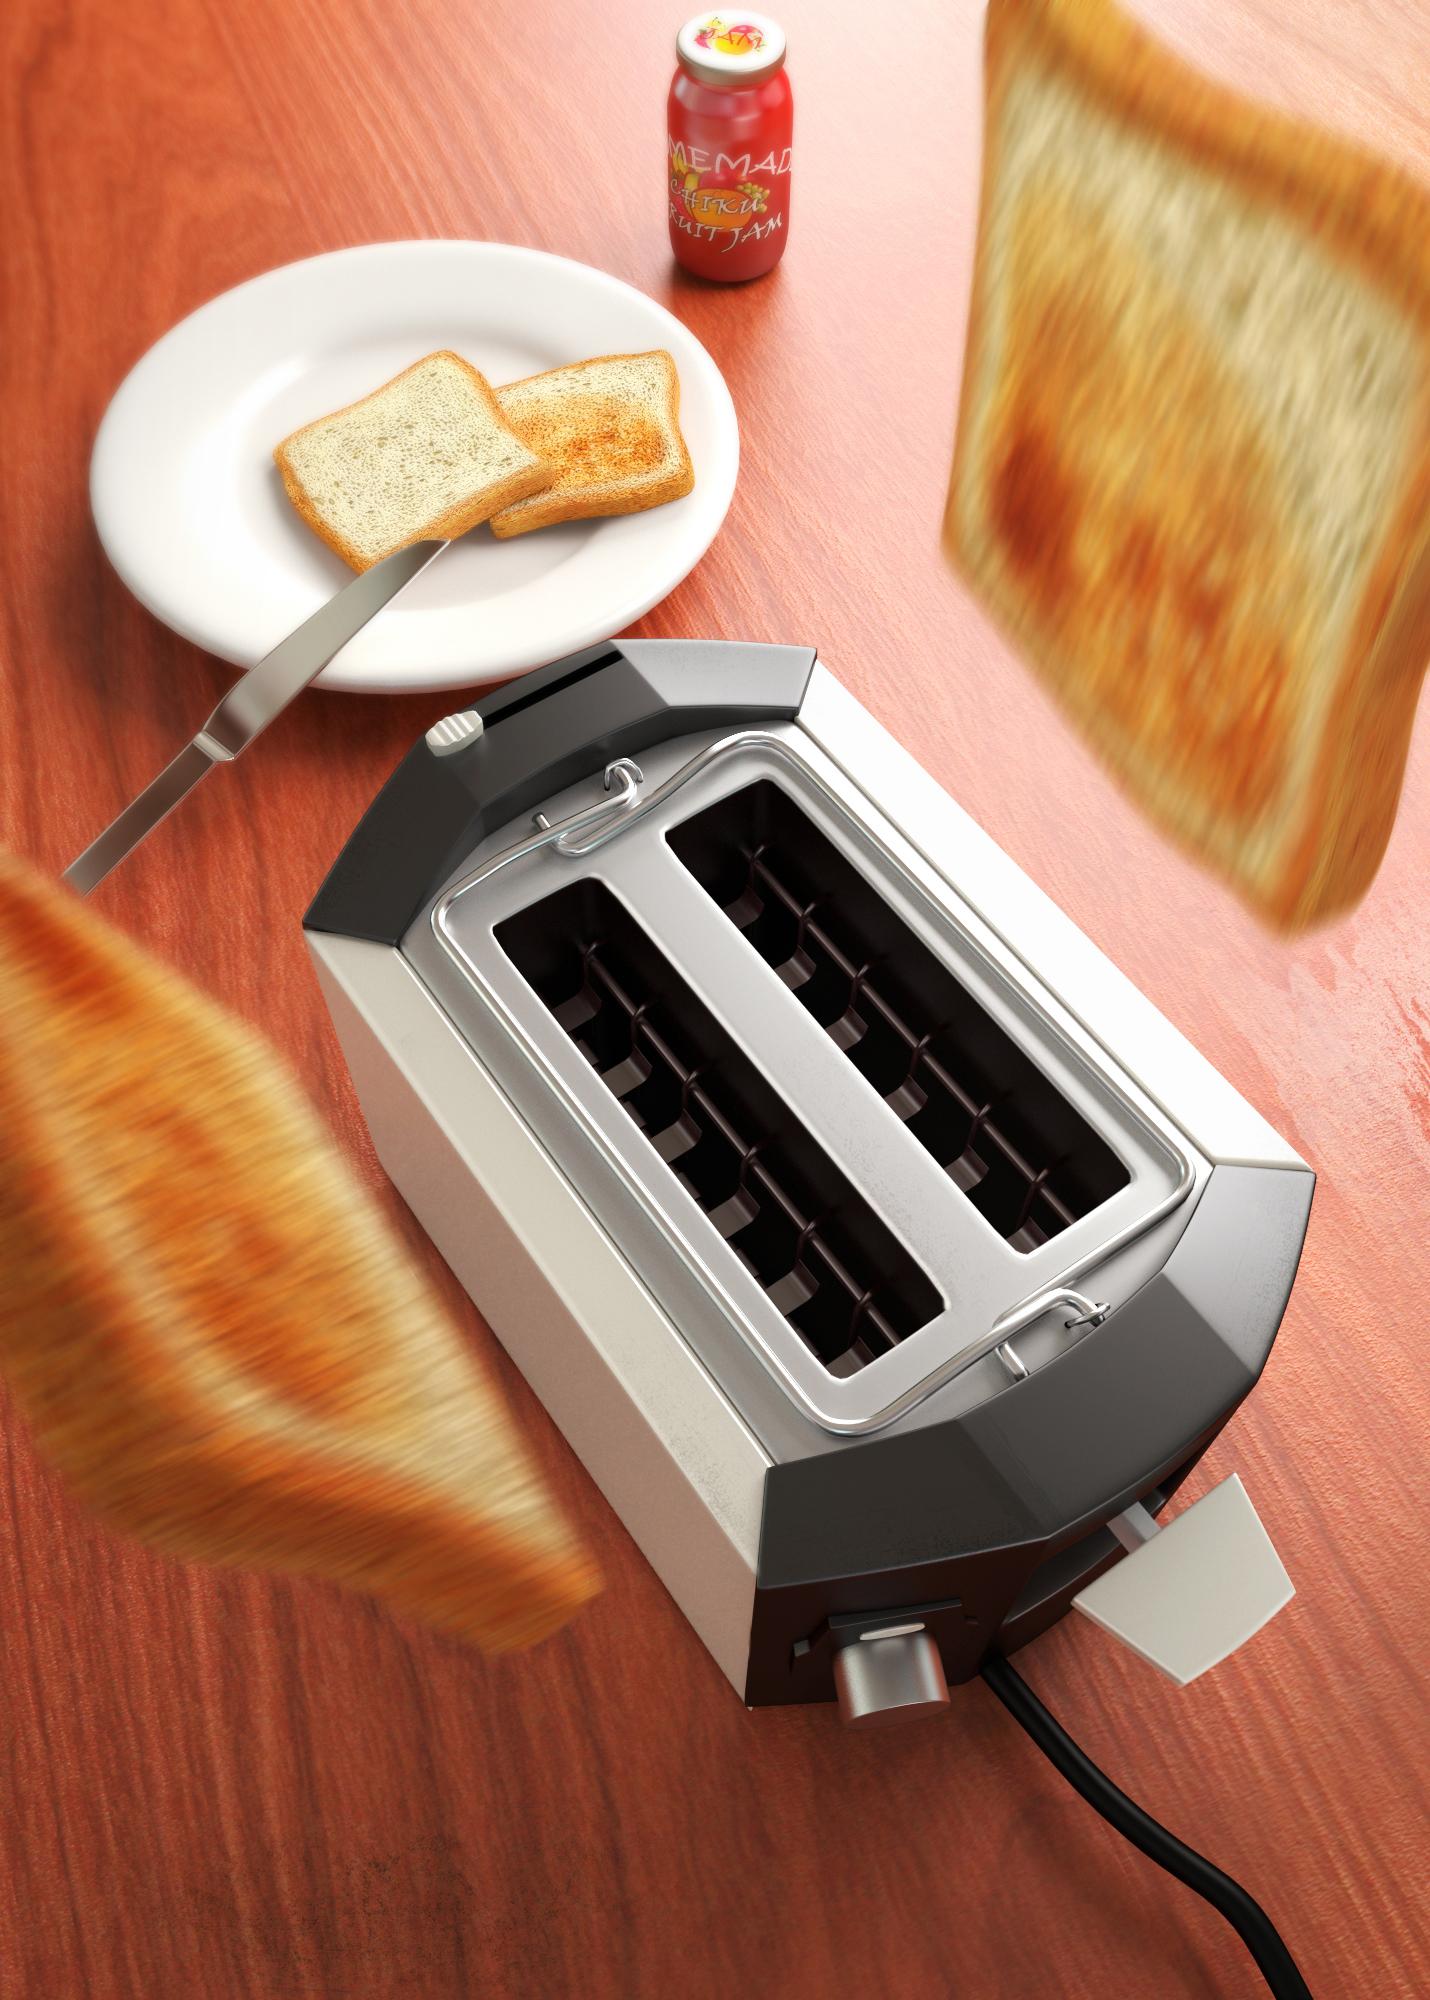 http://fc00.deviantart.net/fs71/f/2012/199/5/9/toaster_3d_by_axel_redfield-d57eqjm.jpg